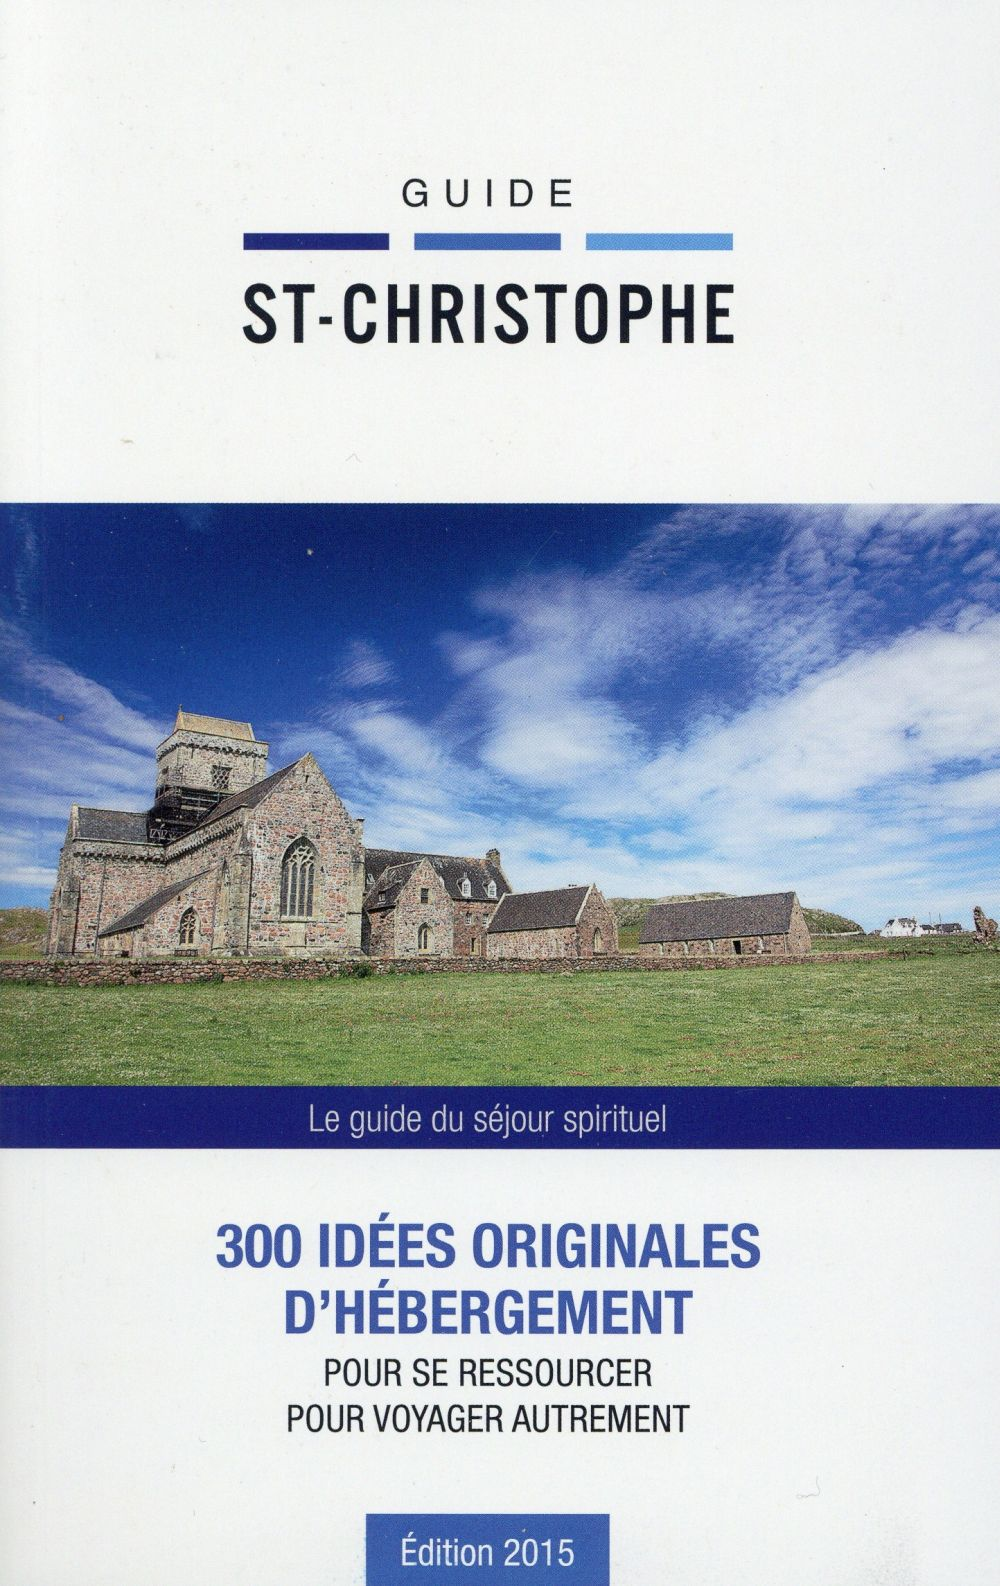 GUIDE SAINT CHRISTOPHE 2015